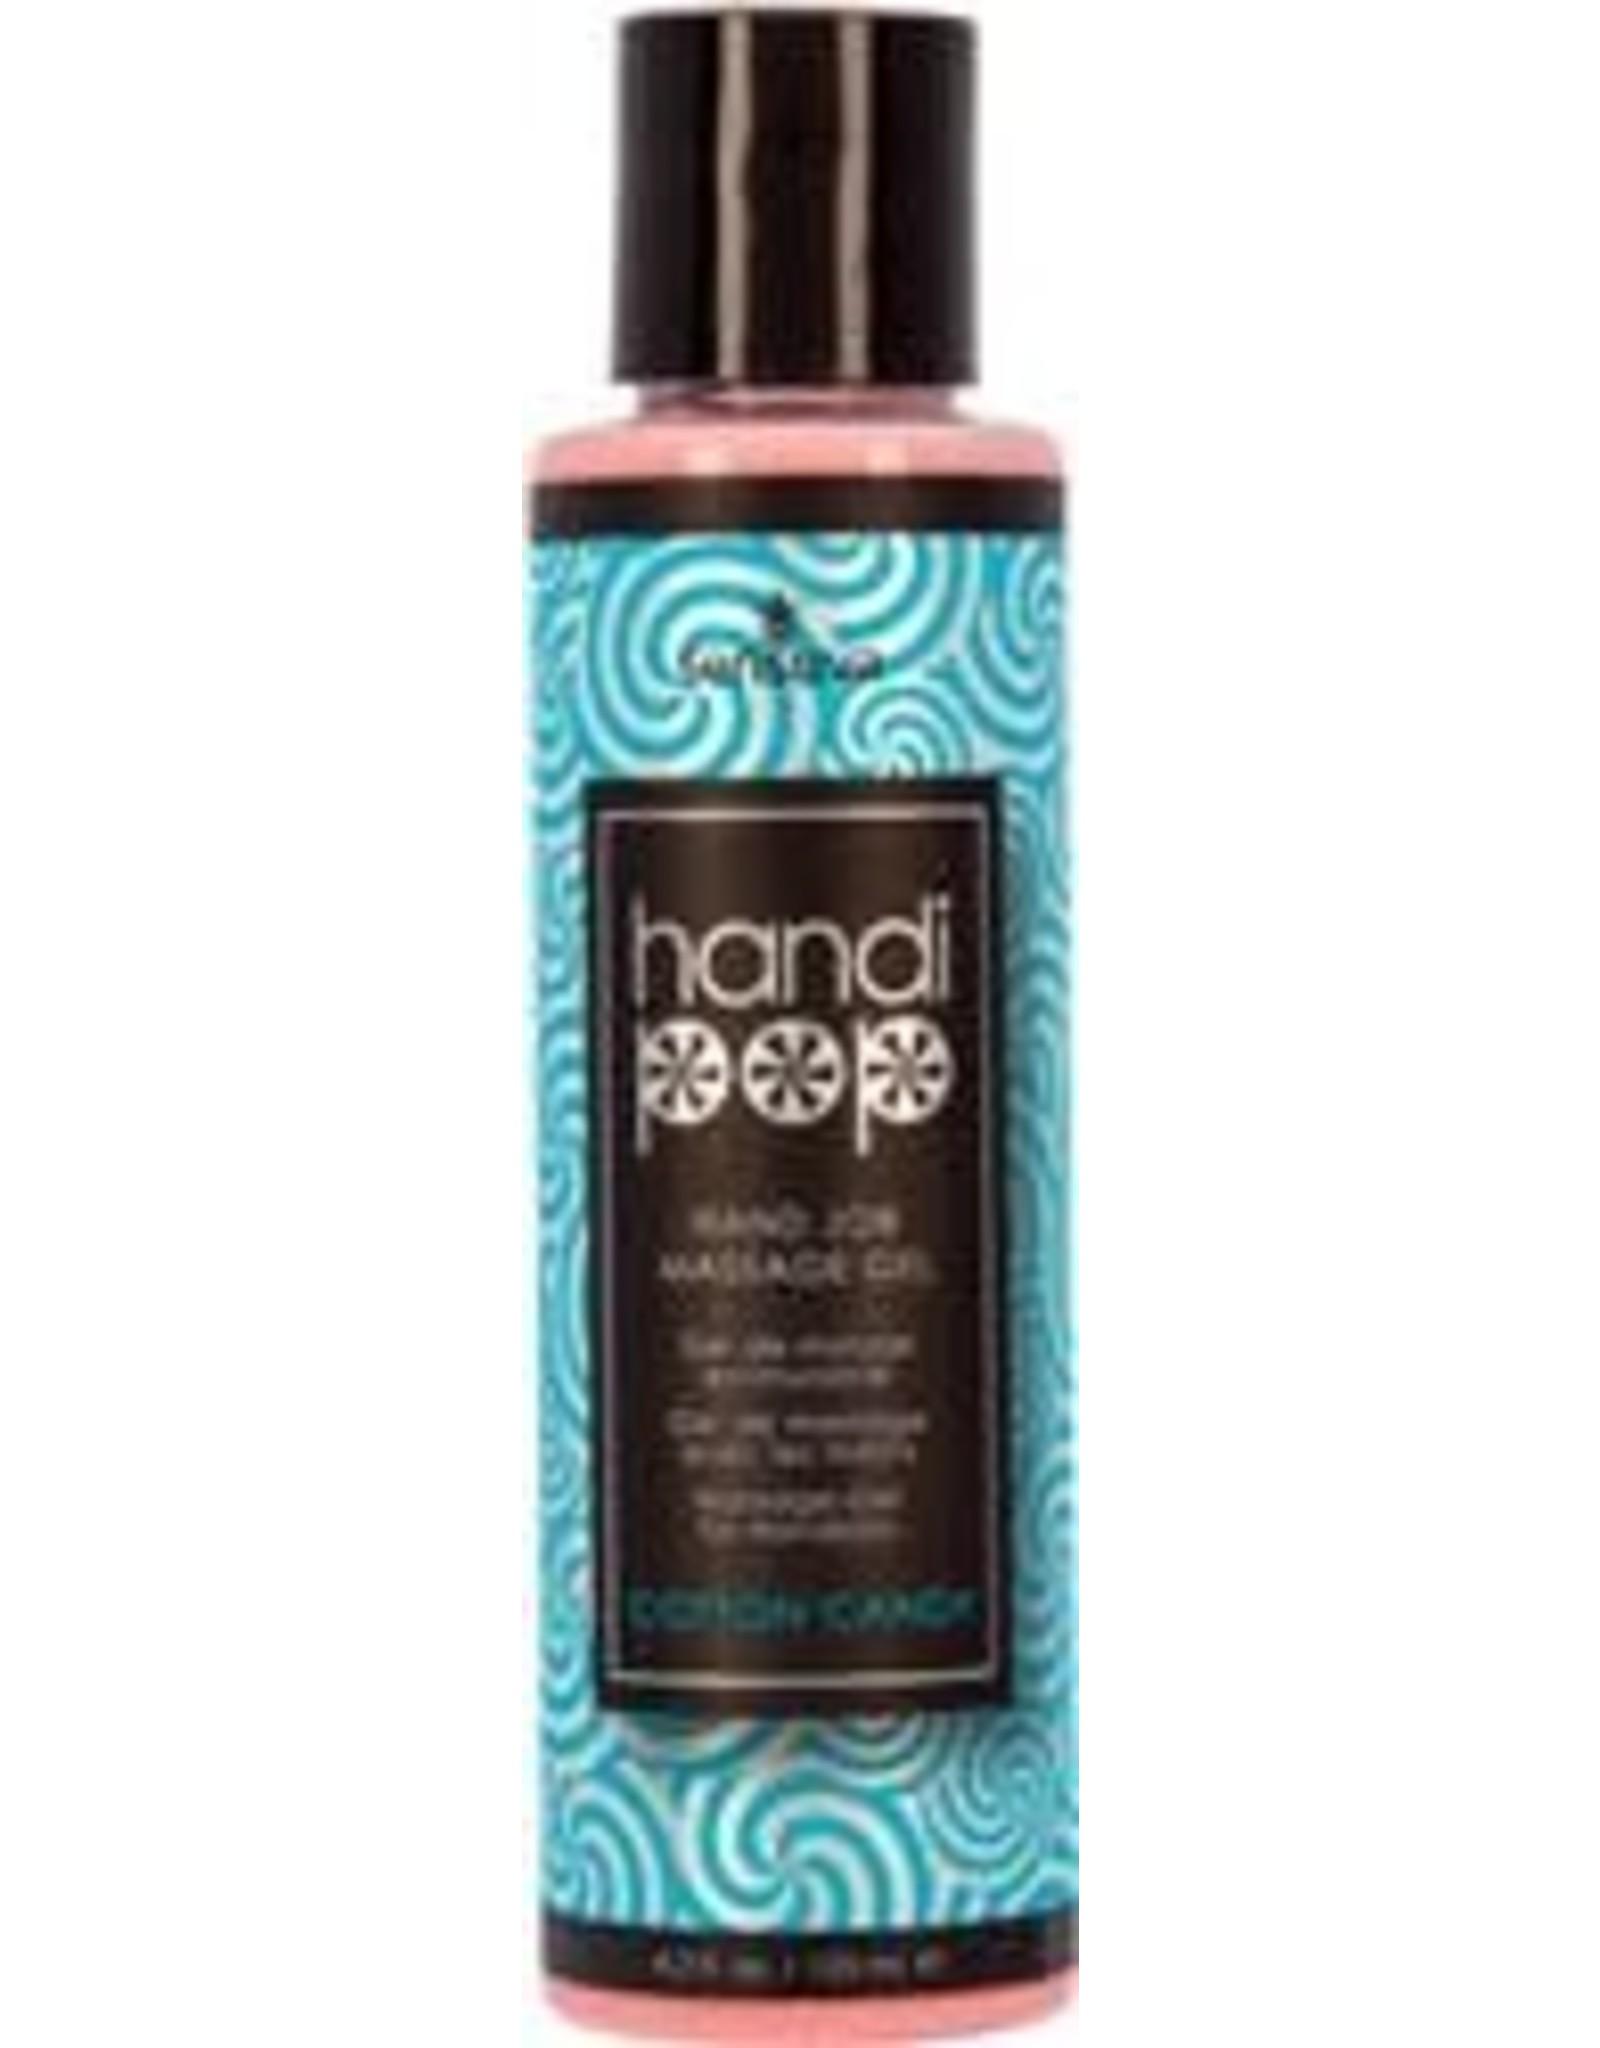 Sensuva Handi Pop -Hand Job Massage Gel - Cotton Candy - 4.2 oz